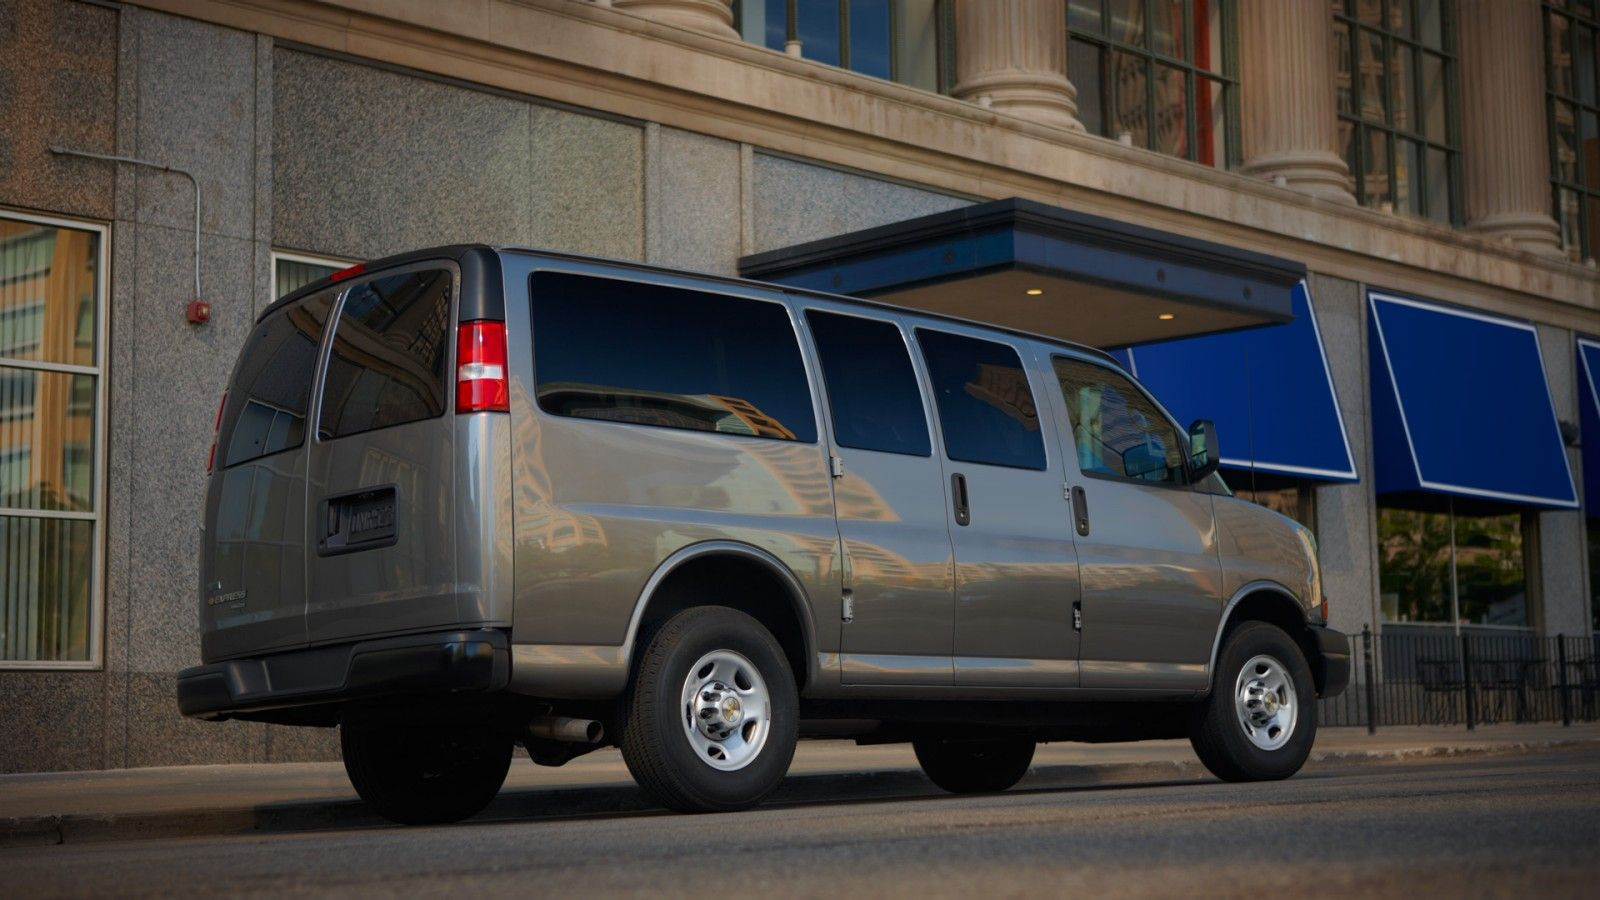 medium resolution of chevy express 3500 passenger van in graystone metallic